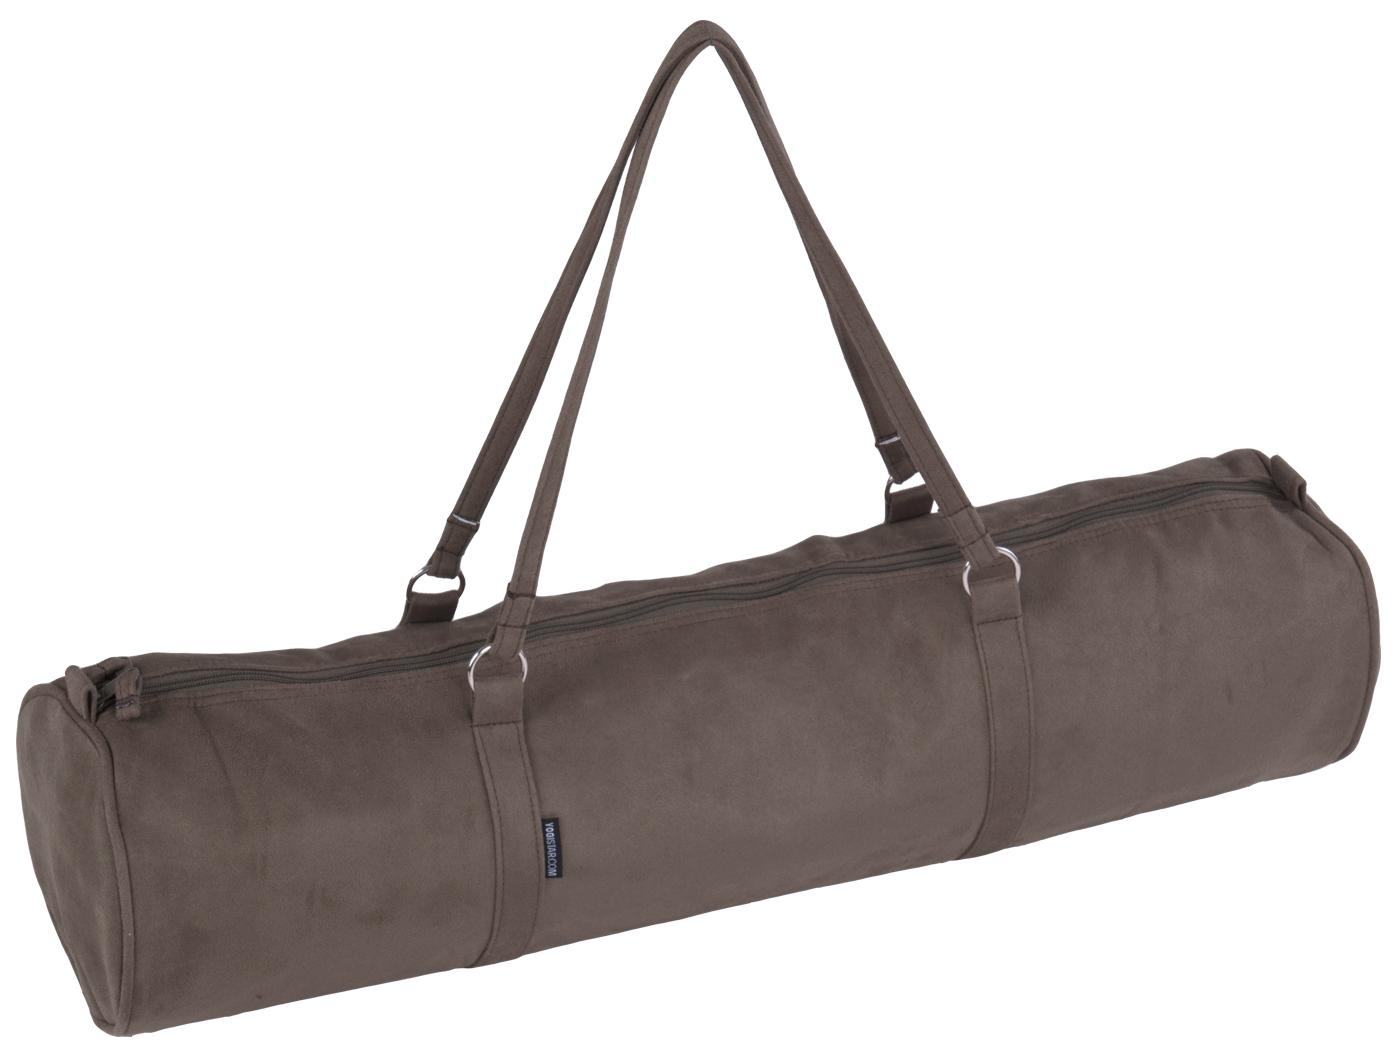 Yogatasche style - zip - velour - 69 cm